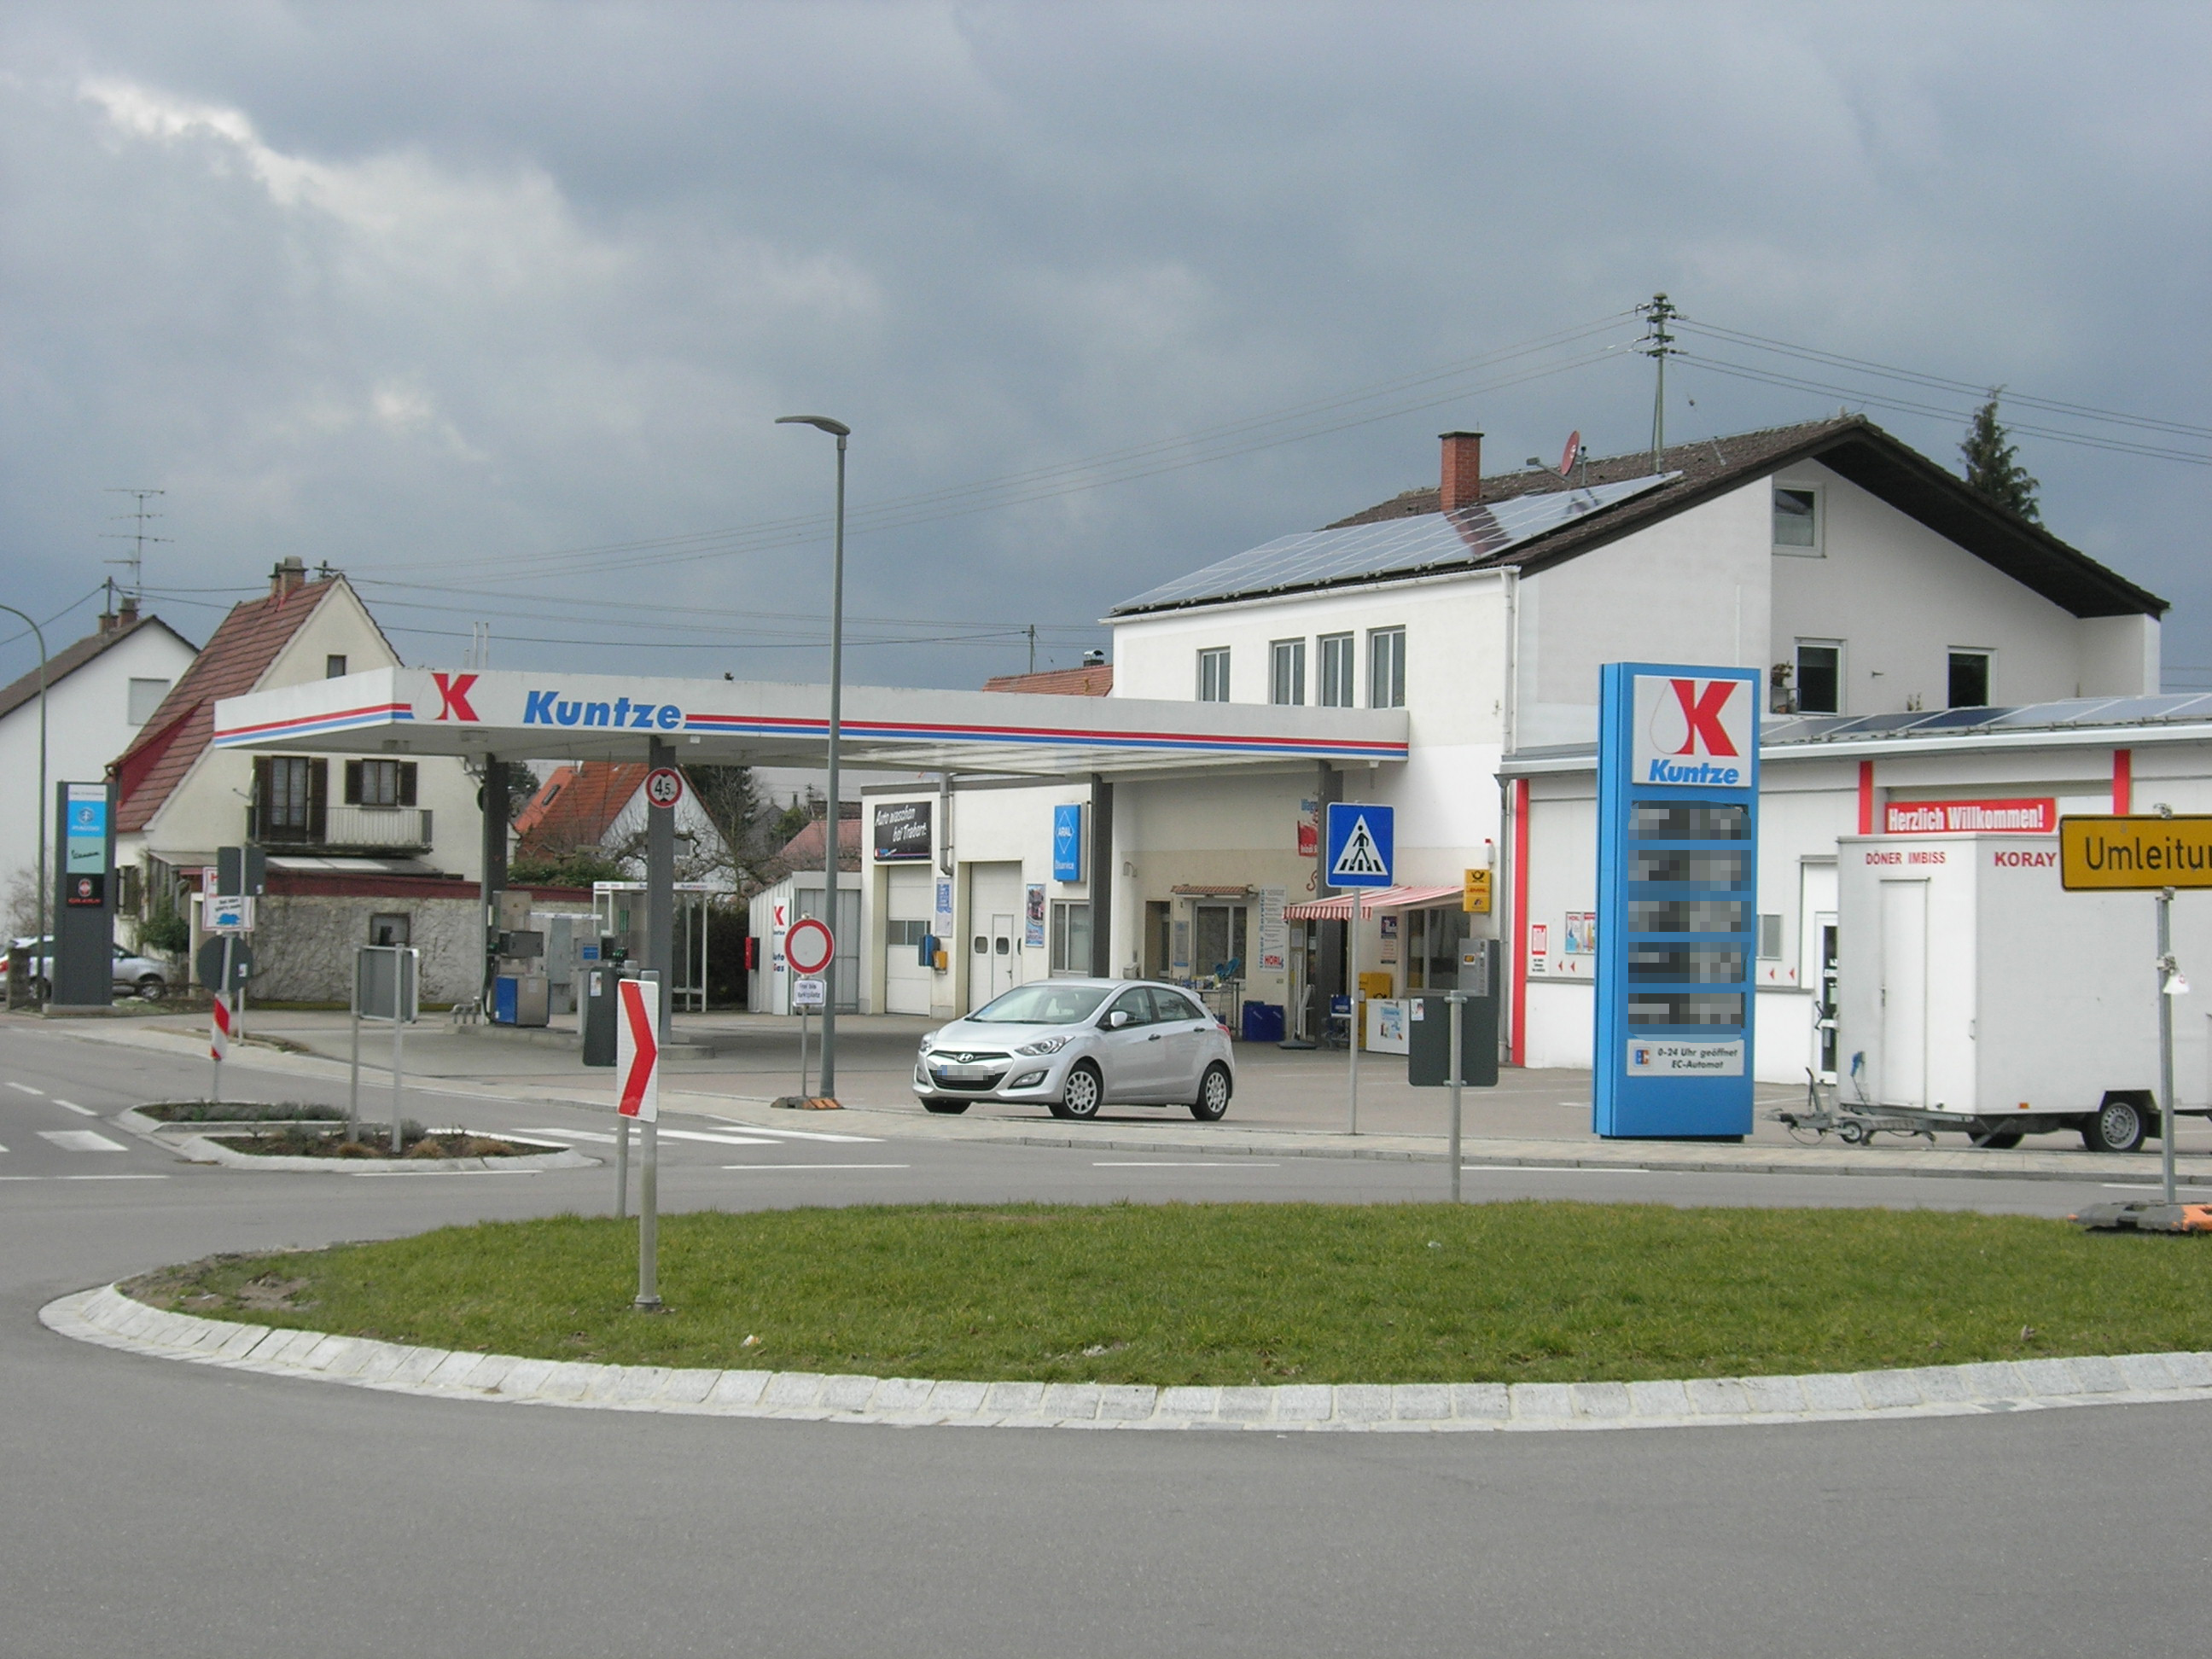 Tankstelle Kuntze